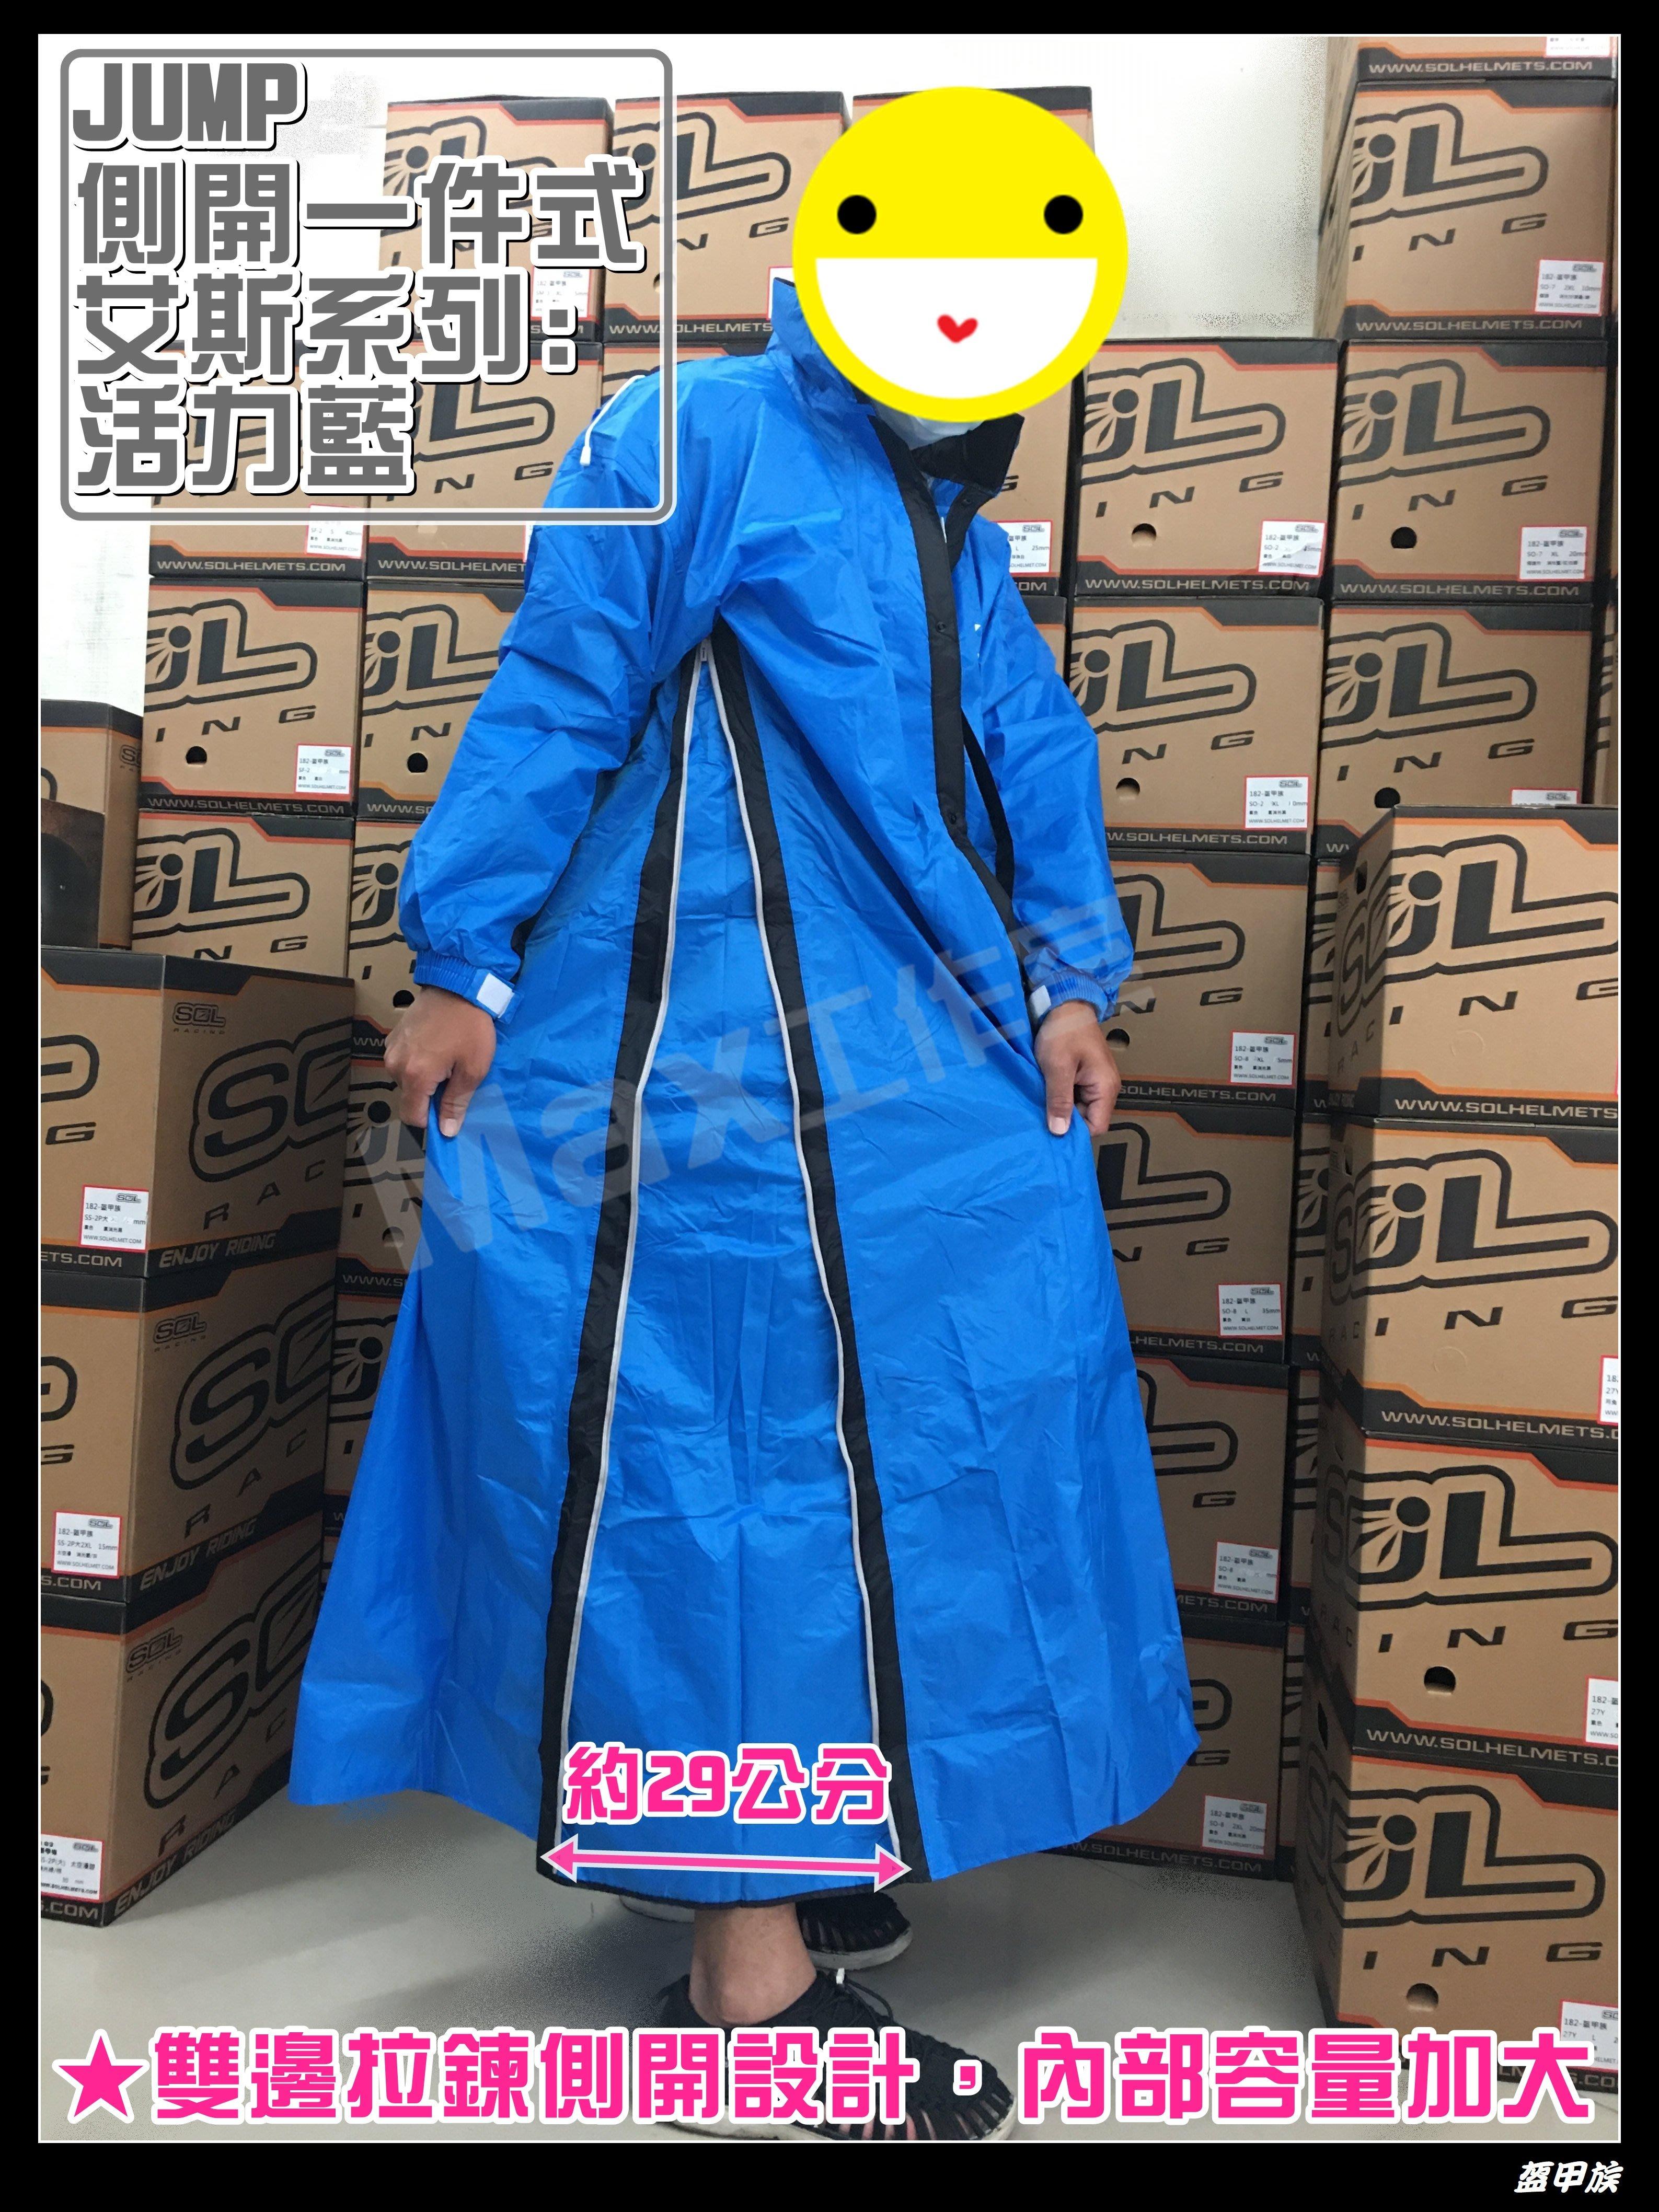 Max工作室~雙側開 一件式 雨衣【JUMP 艾斯系列 JP-6699A:寶藍】前開 連身式 風雨衣 超取OK^^